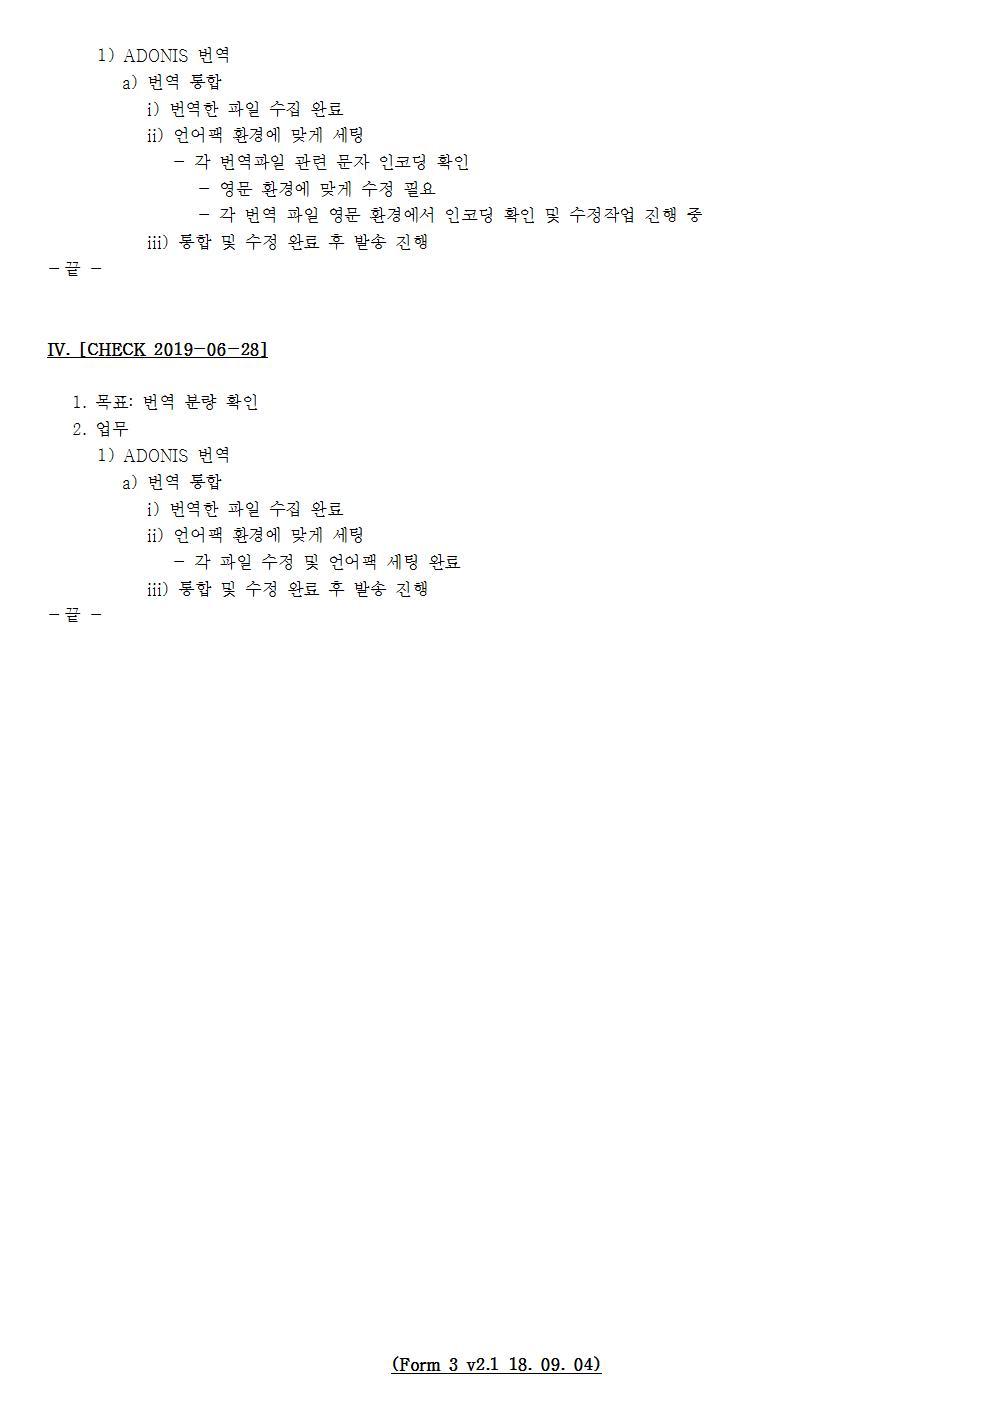 D-[19-033-BZ-05]-[ADONIS Translation]-[2019-06-28][YB]-[19-6-4]-[P+D+C]002.jpg